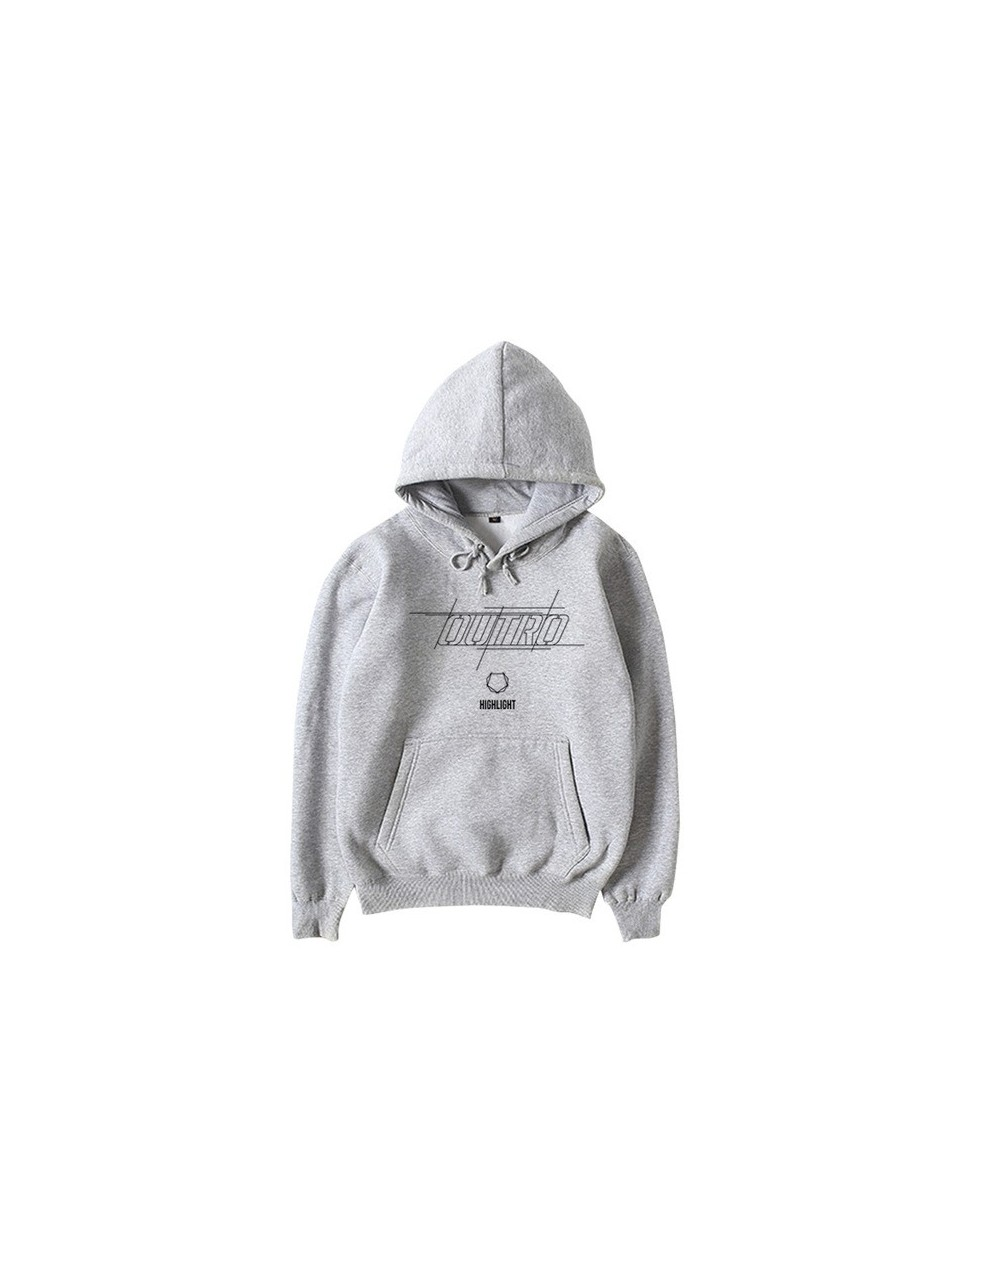 Kpop highlight new album outro same printing pullover hoodies unisex highlight fleece/thin loose sweatshirt 5 colors - thin ...